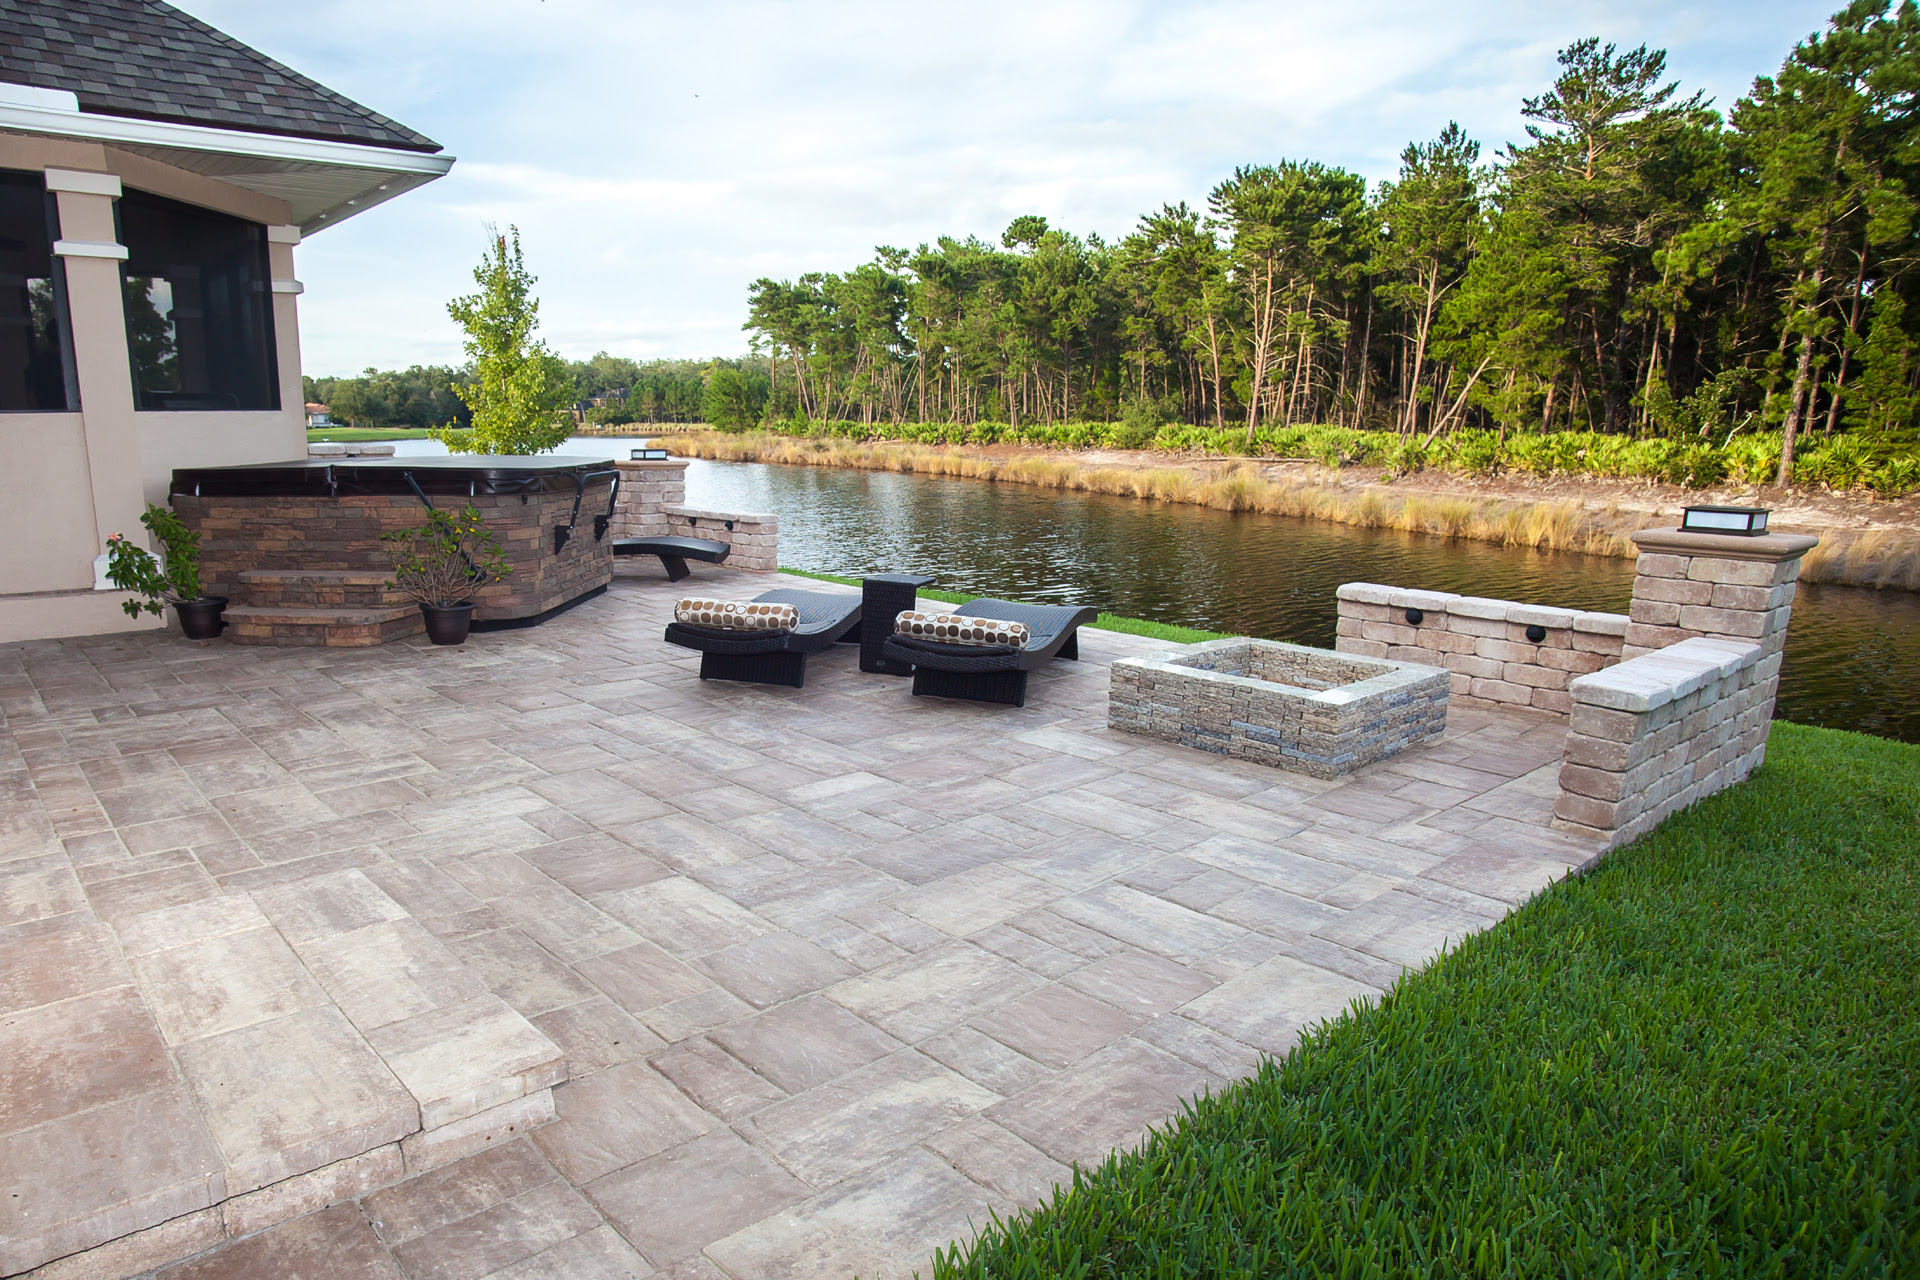 Paver Patio Professionally Installed by Florida Coastal Contractors